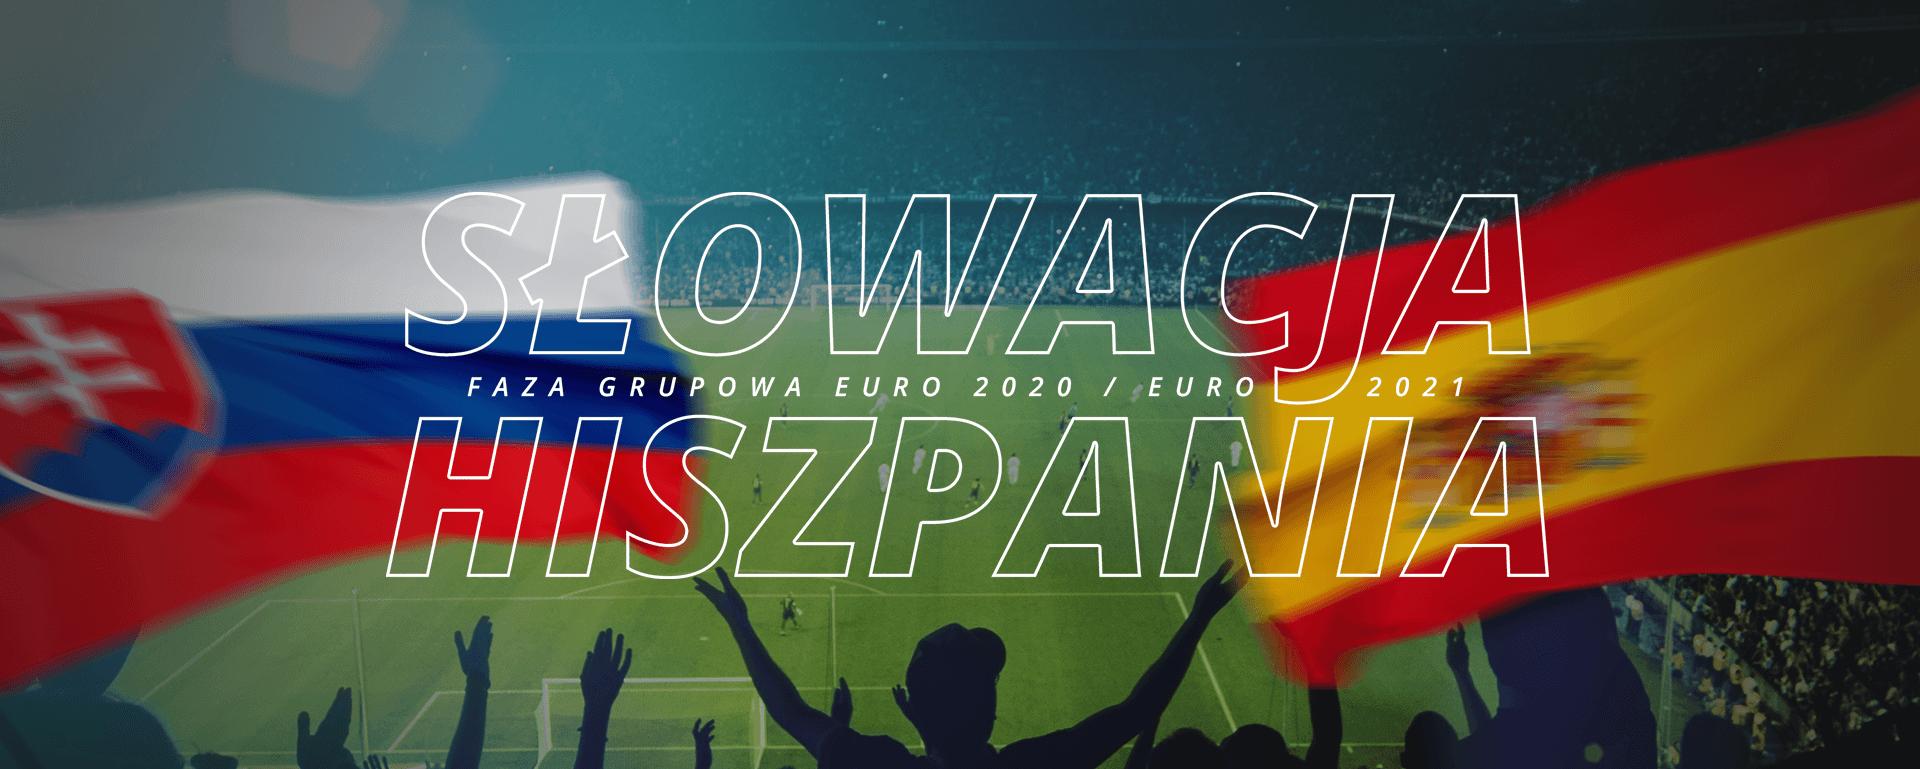 Słowacja – Hiszpania | faza grupowa Euro 2020 / Euro 2021